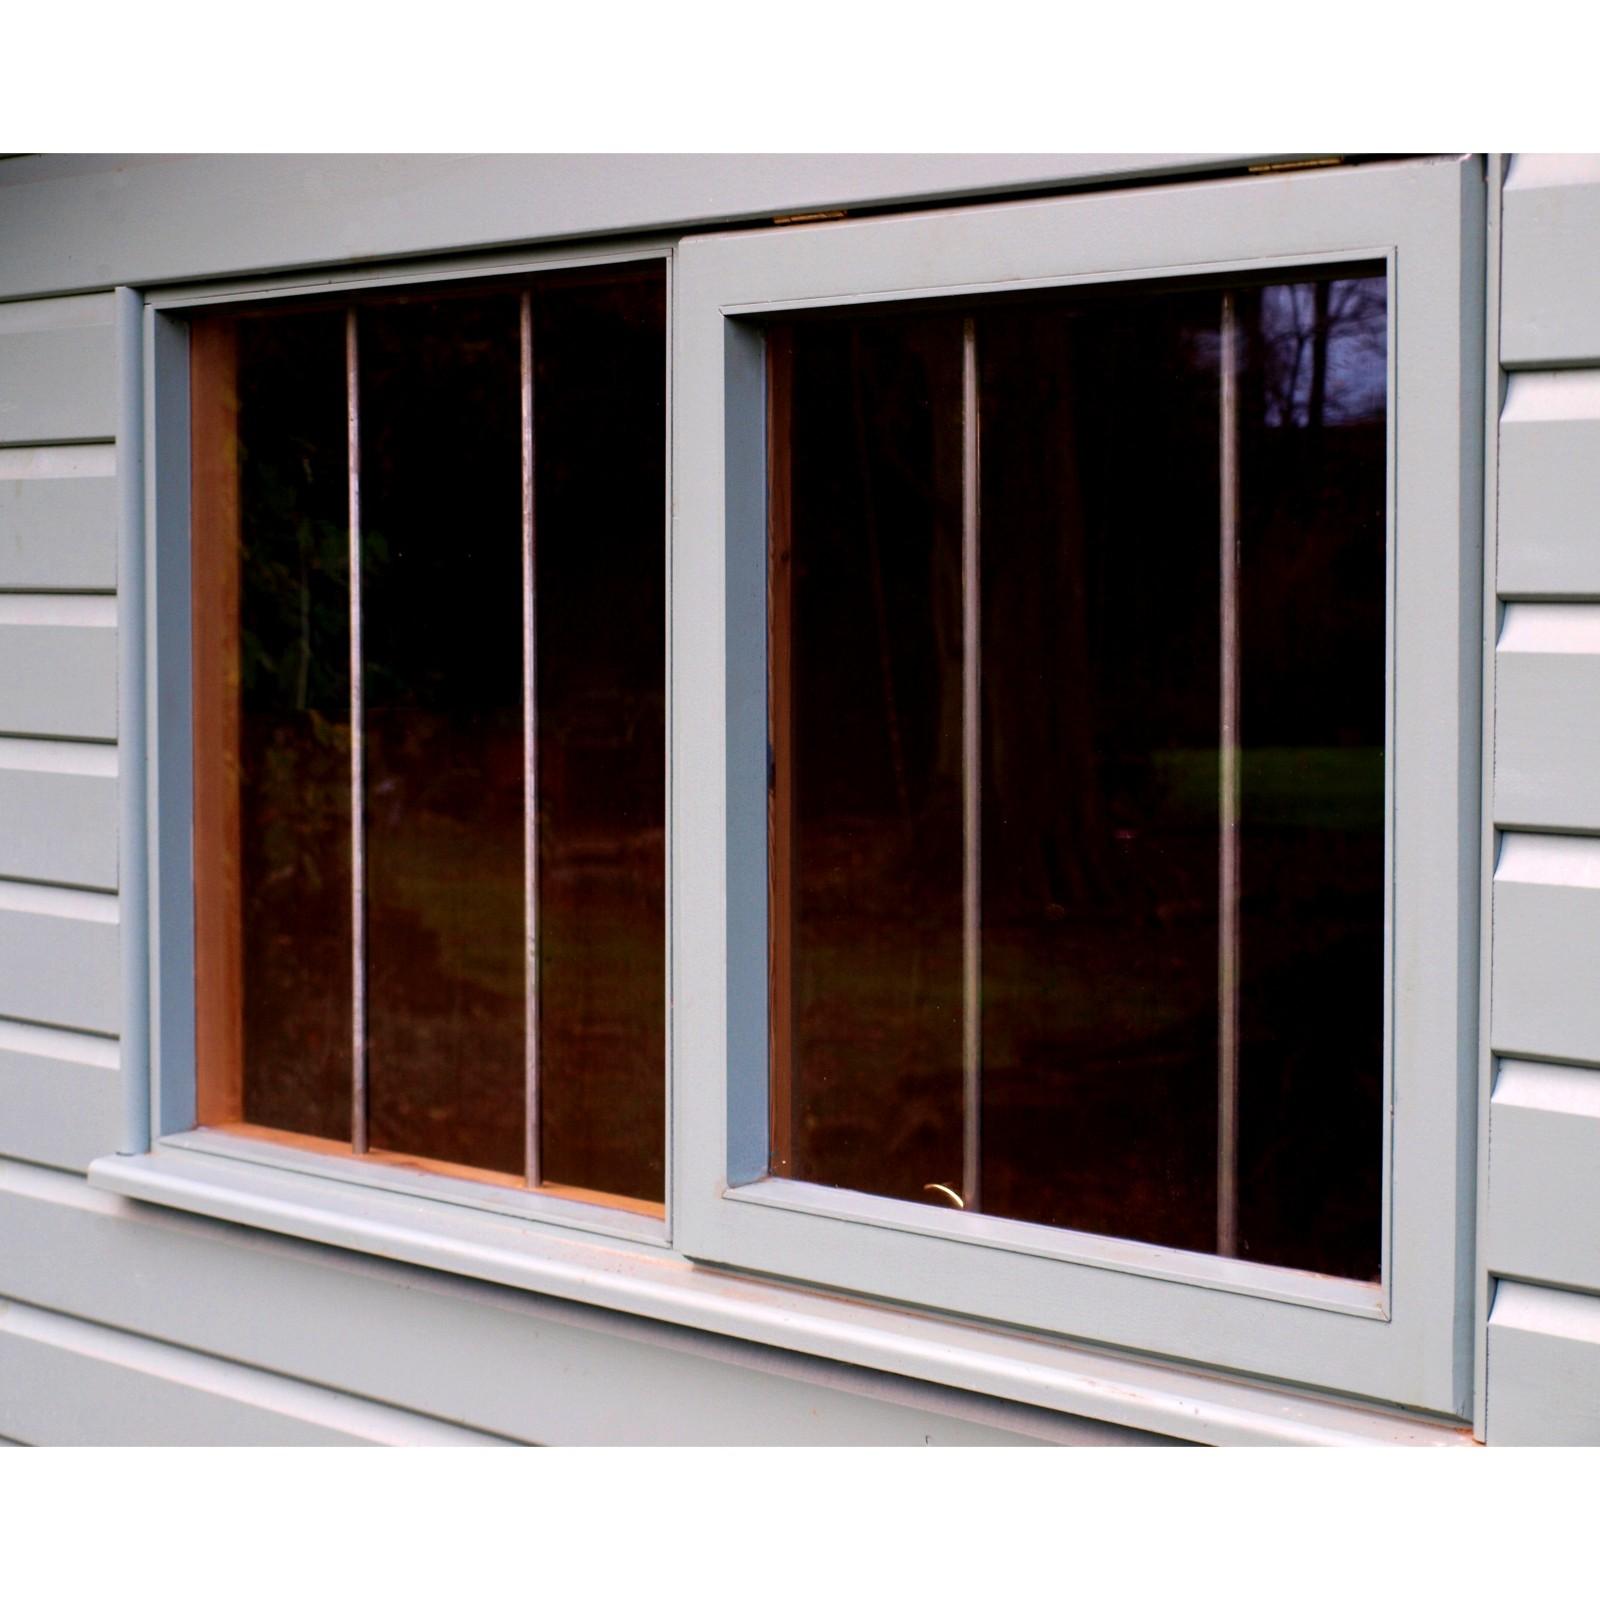 Crane Window Bars for 3x3.6m Workshops